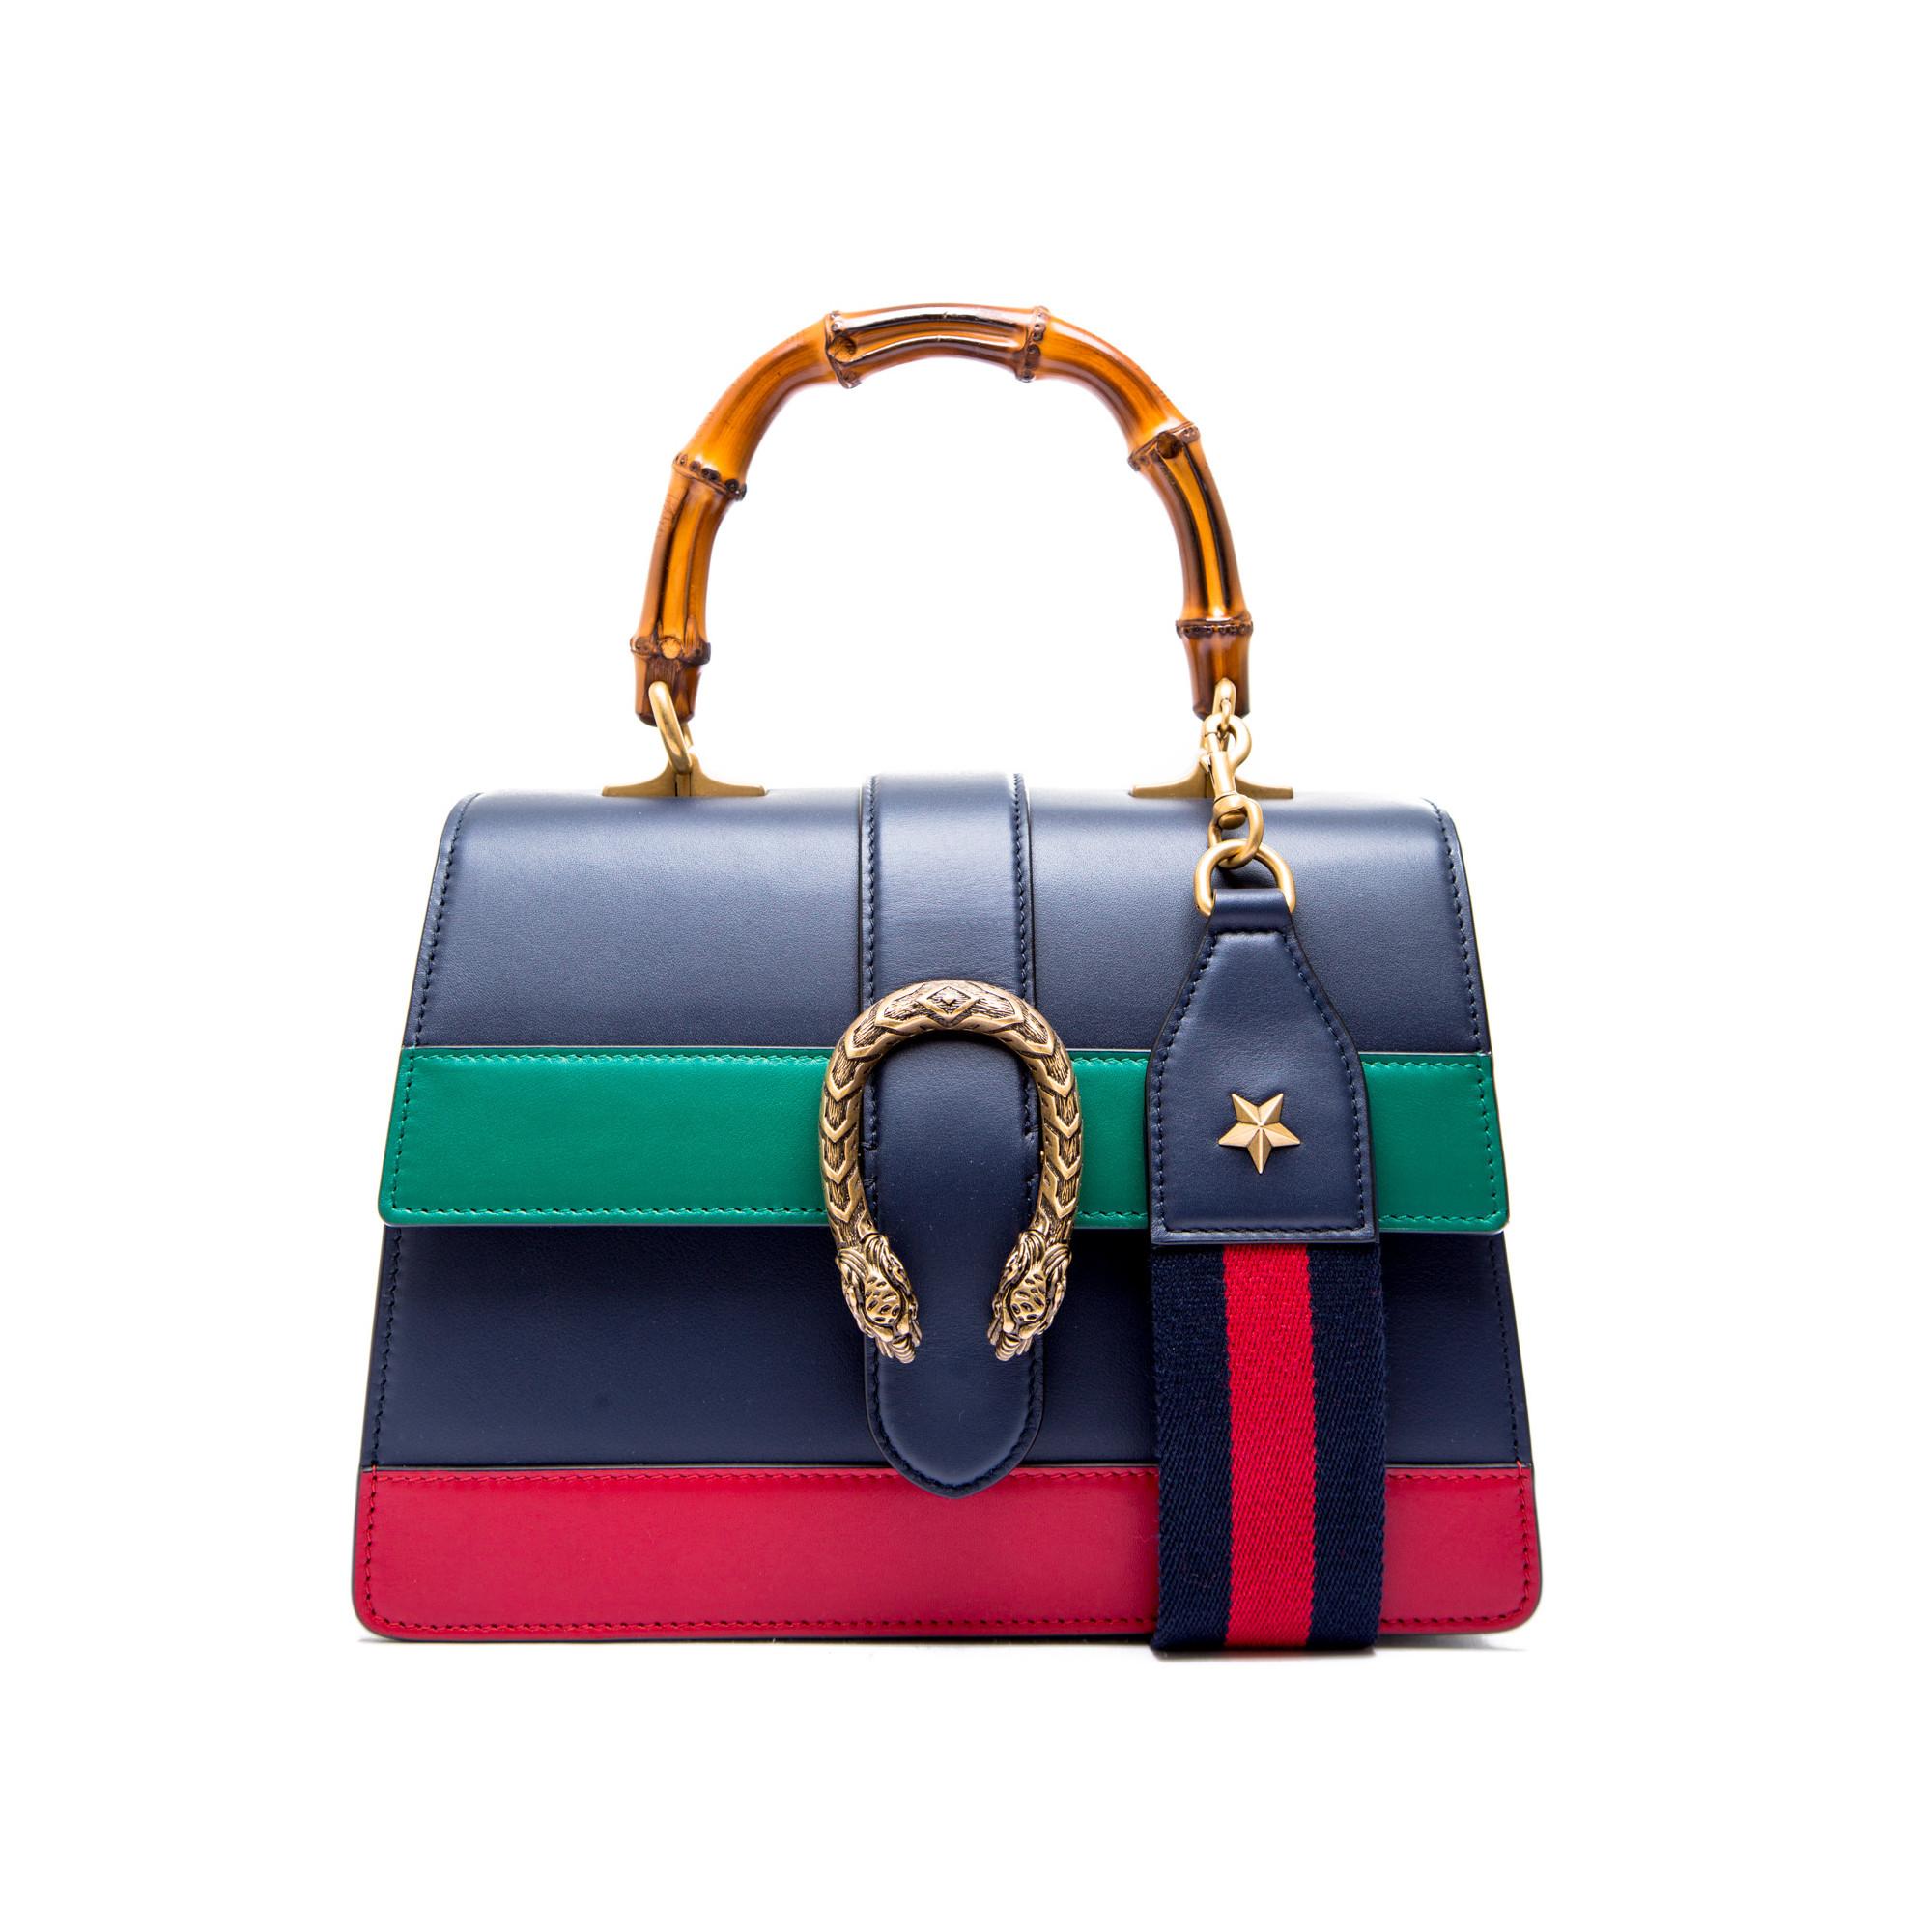 3e4feb0e6e46 Gucci handbag dionysus gucci handbag dionysus derodeloper jpg 2000x2000  Gucci handbag